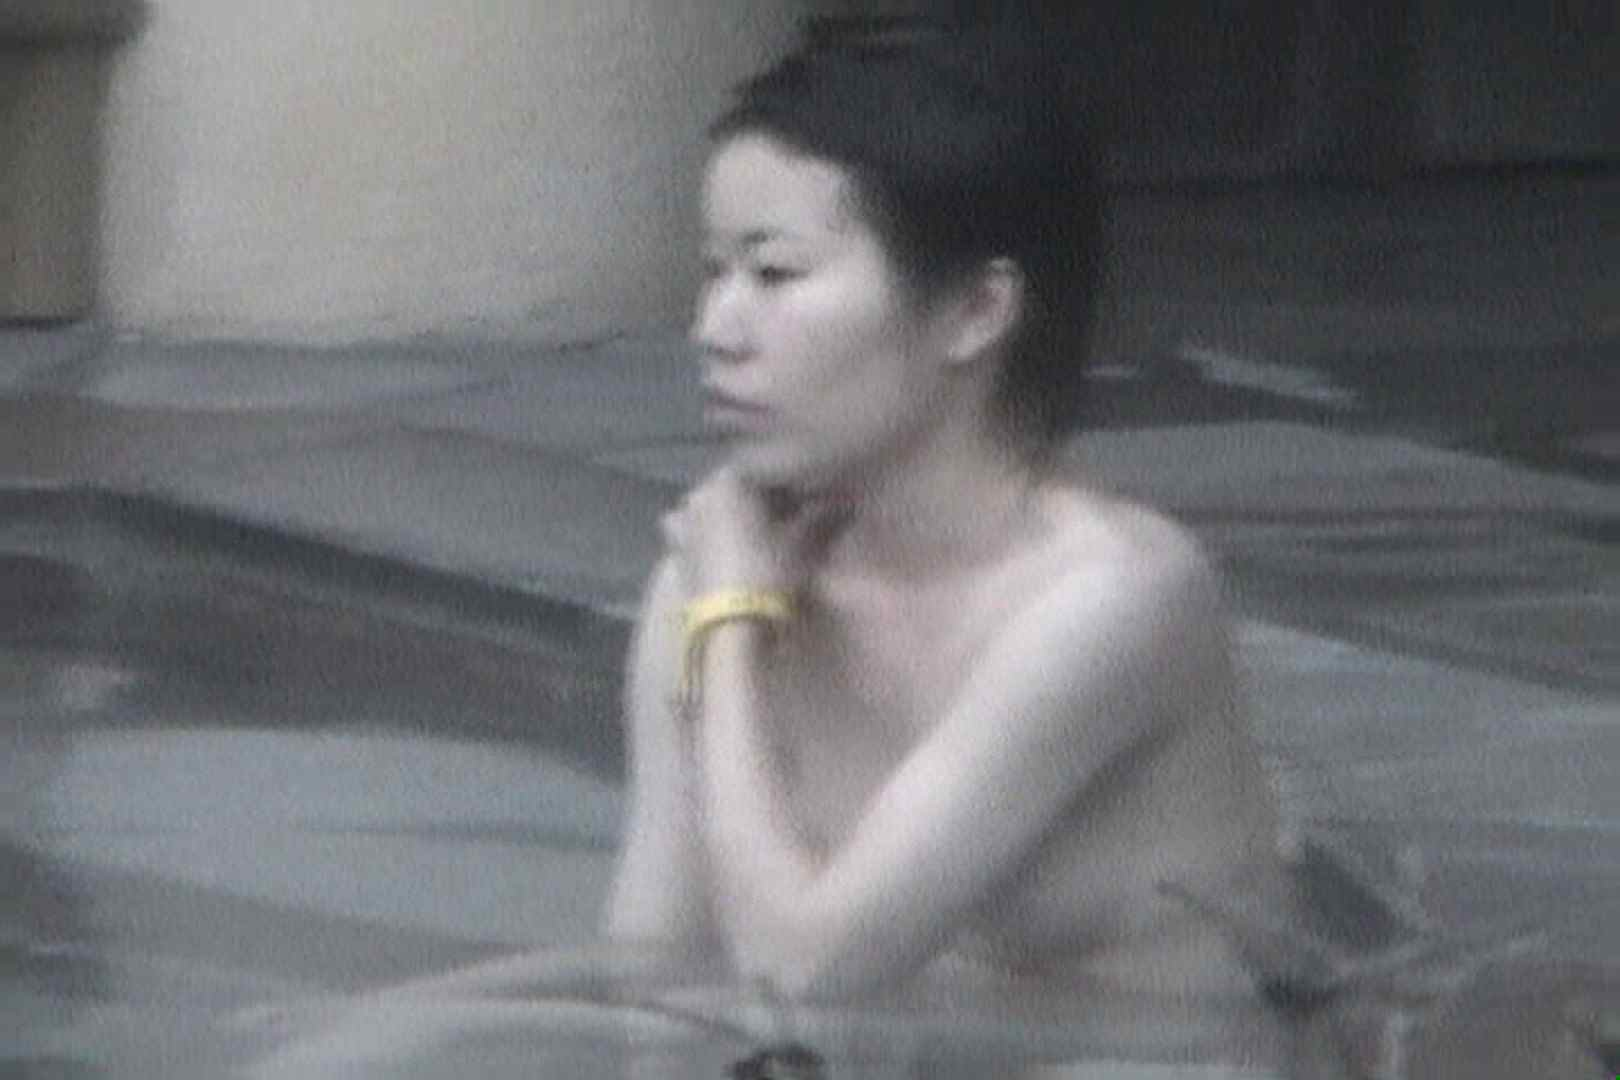 Aquaな露天風呂Vol.556 露天風呂突入 | 盗撮師作品  69pic 46